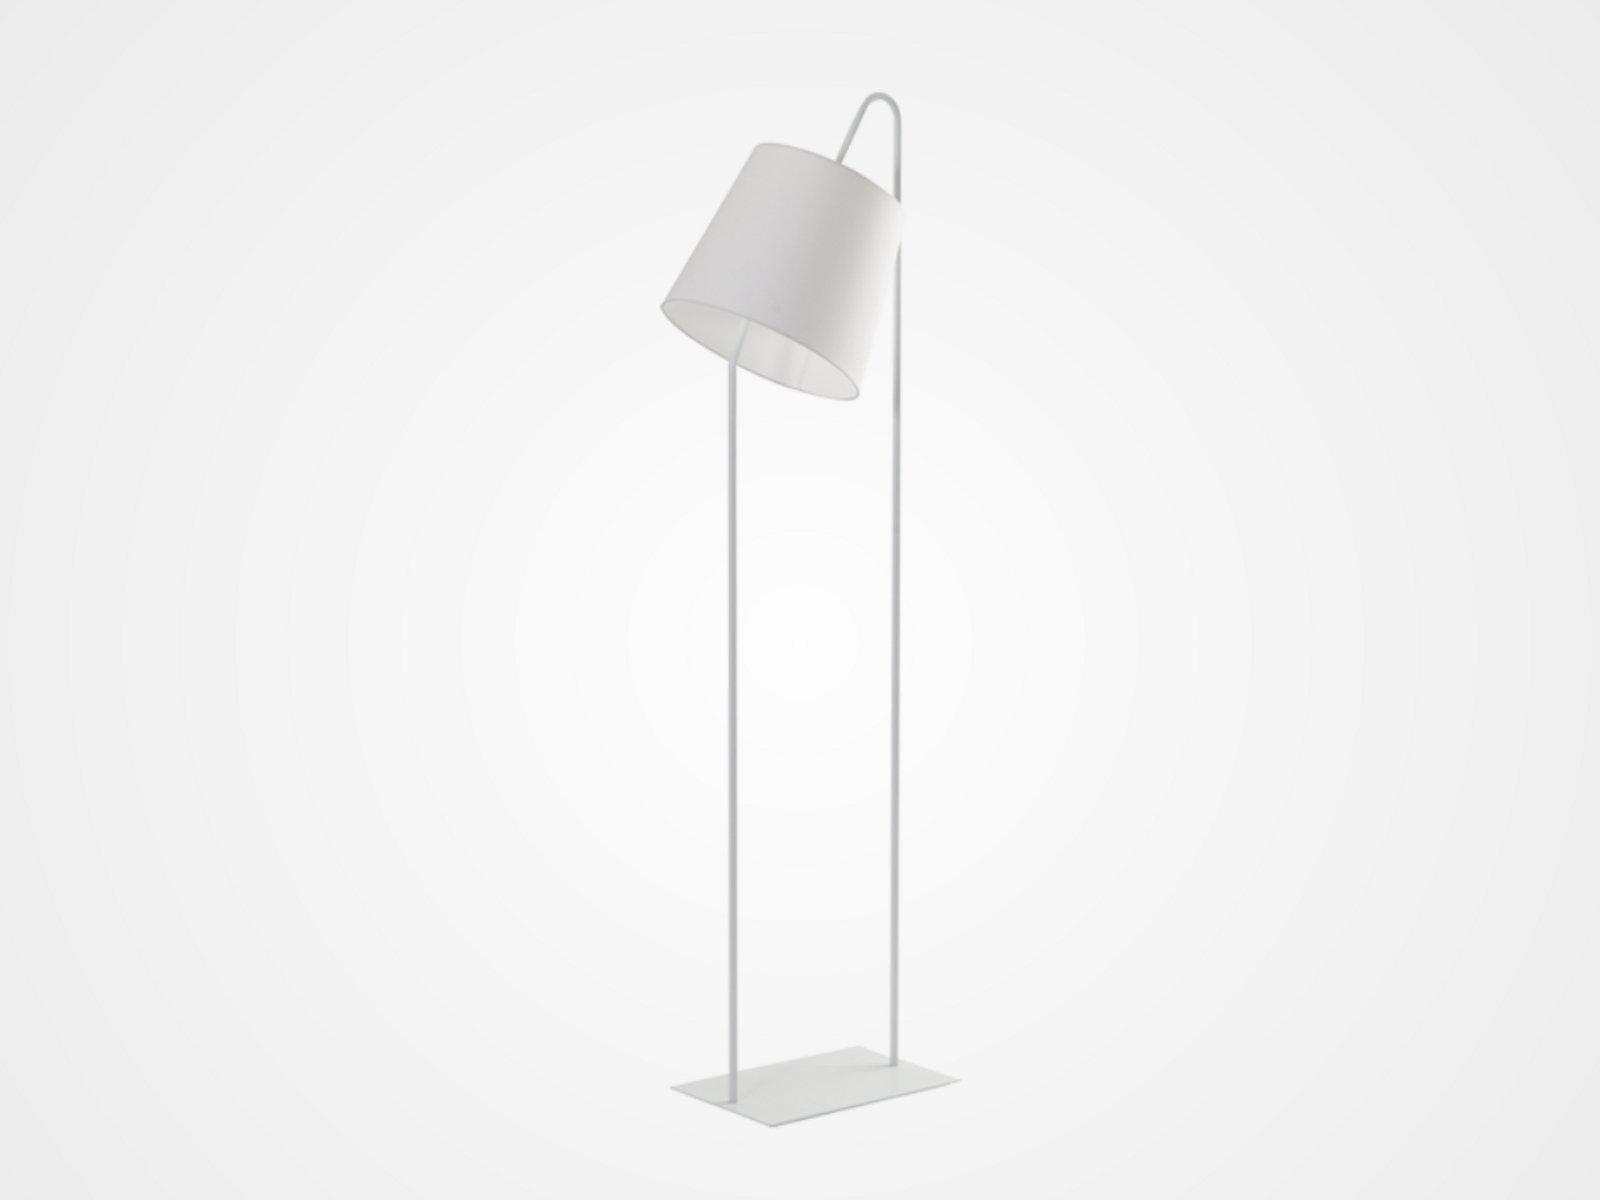 Lampadaire en pvc bi lampadaire roche bobois - Lampadaire design roche bobois ...